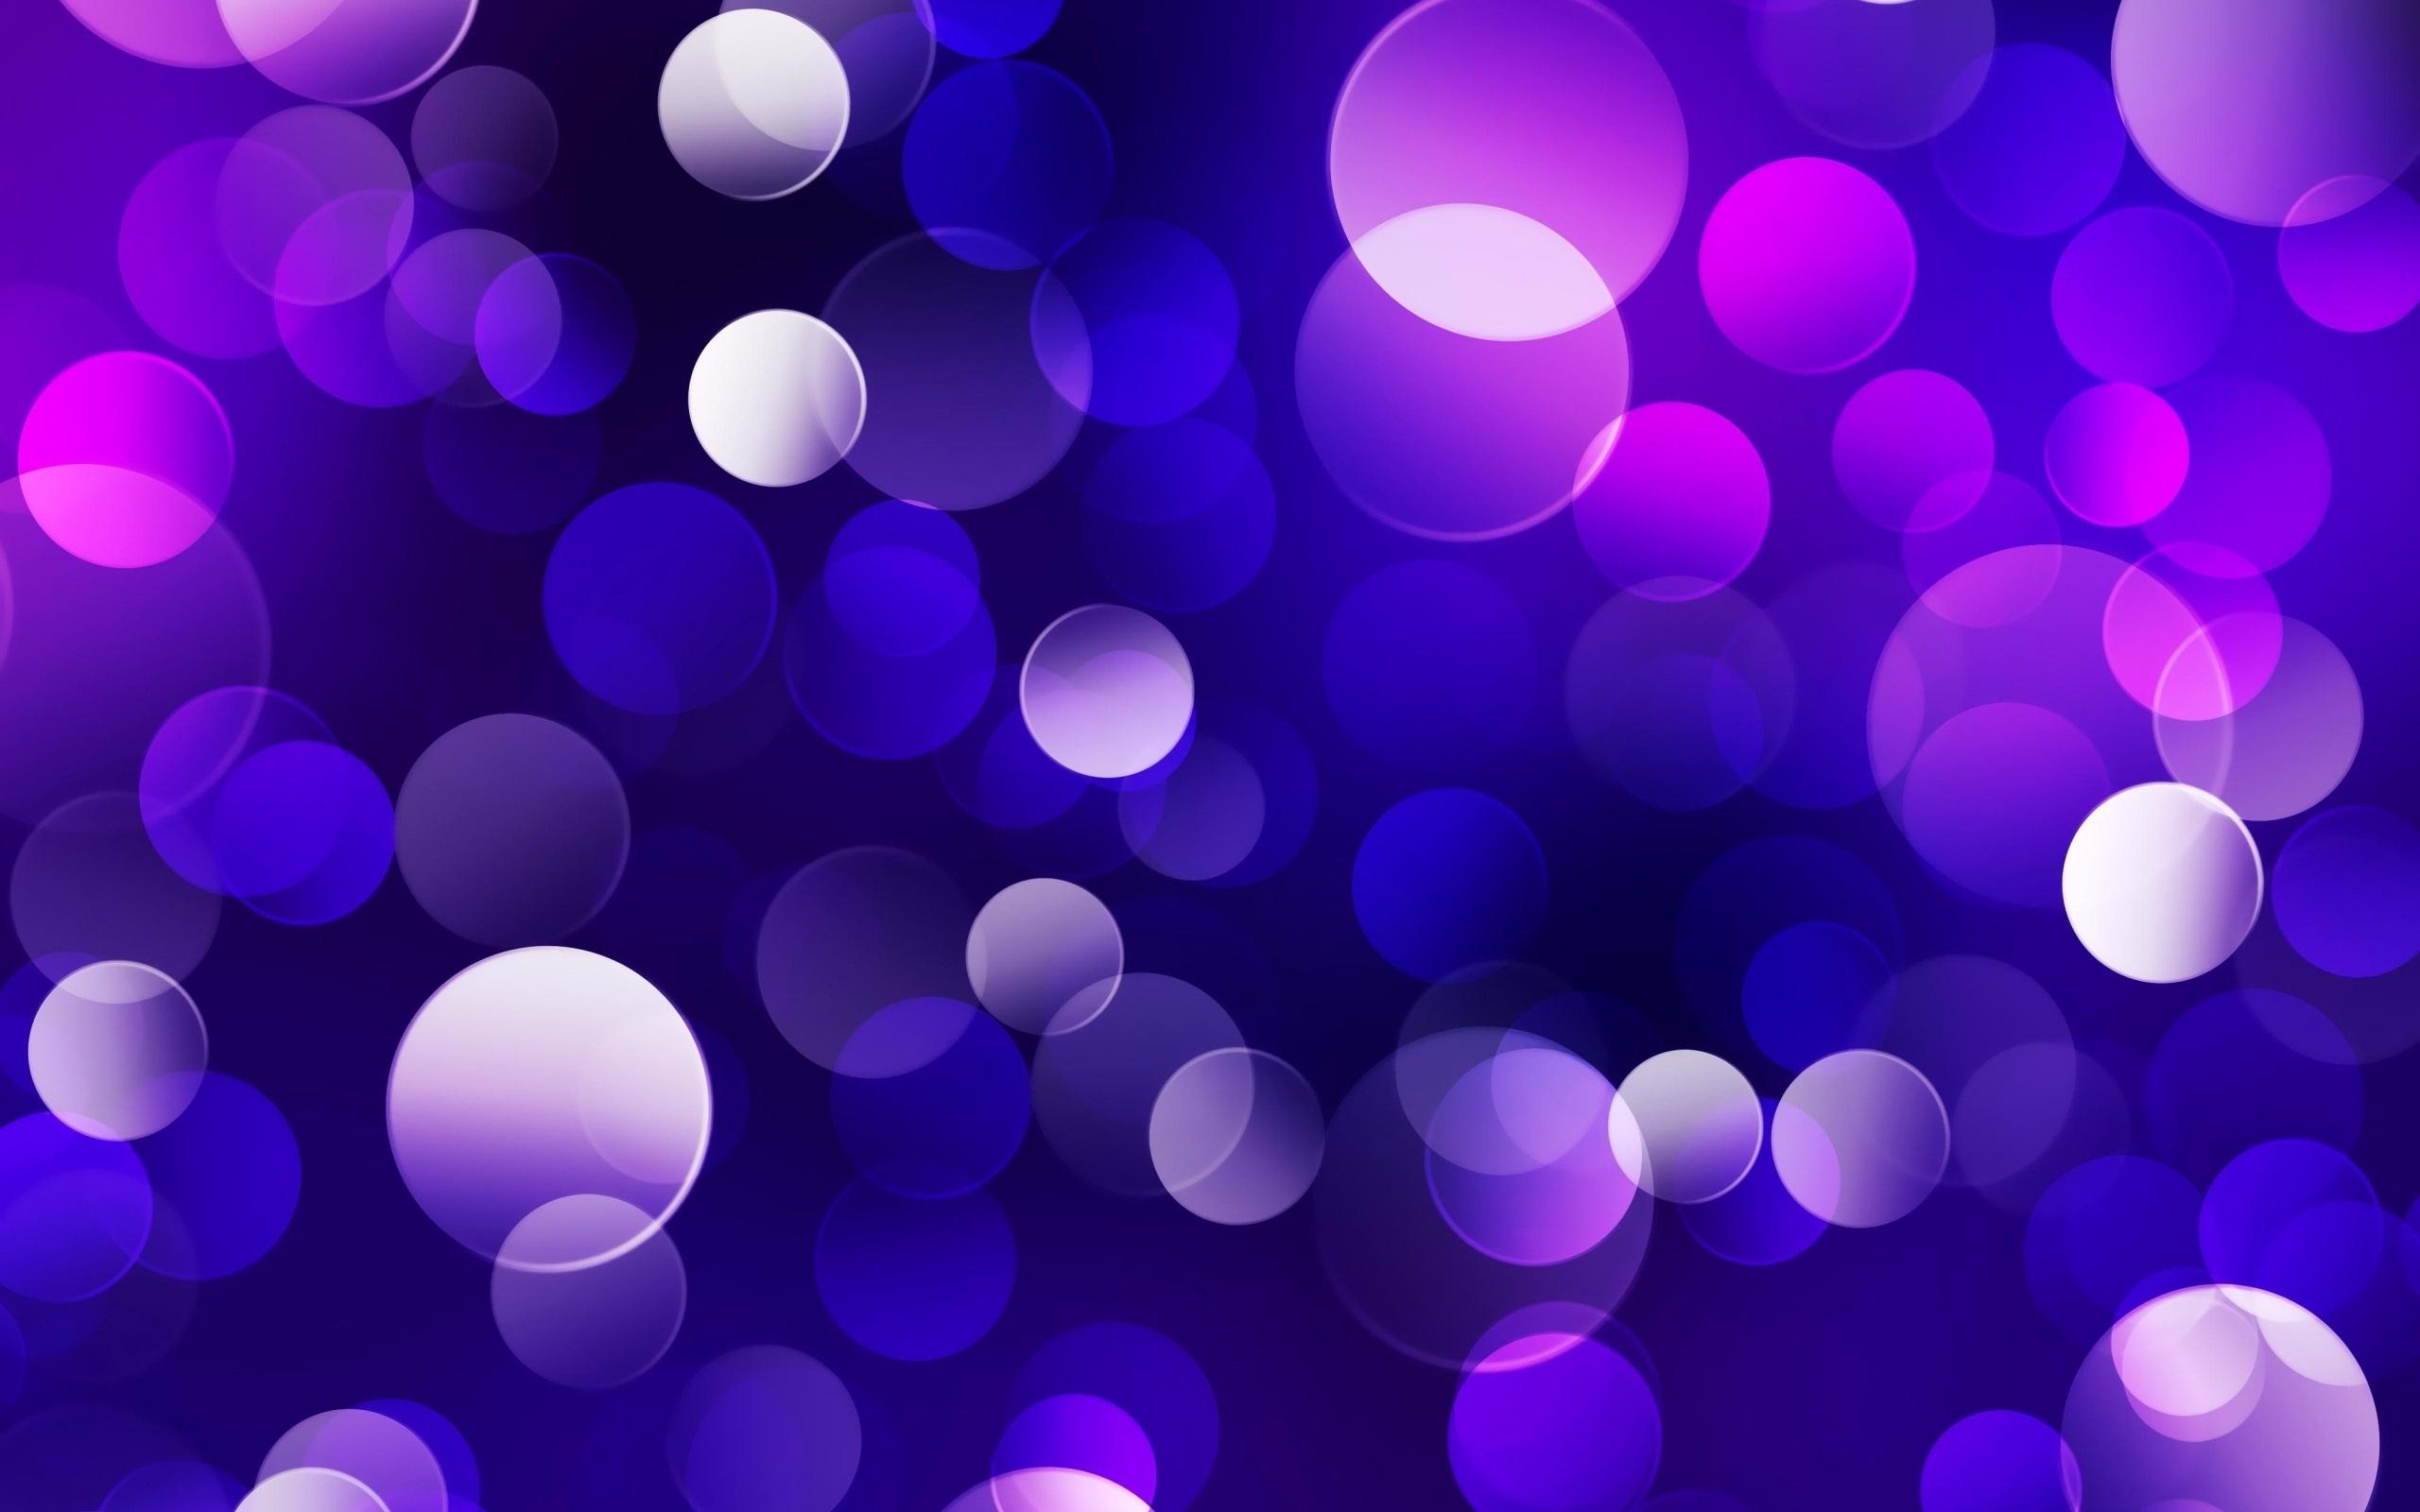 Purple Backgrounds Free Download  PixelsTalkNet